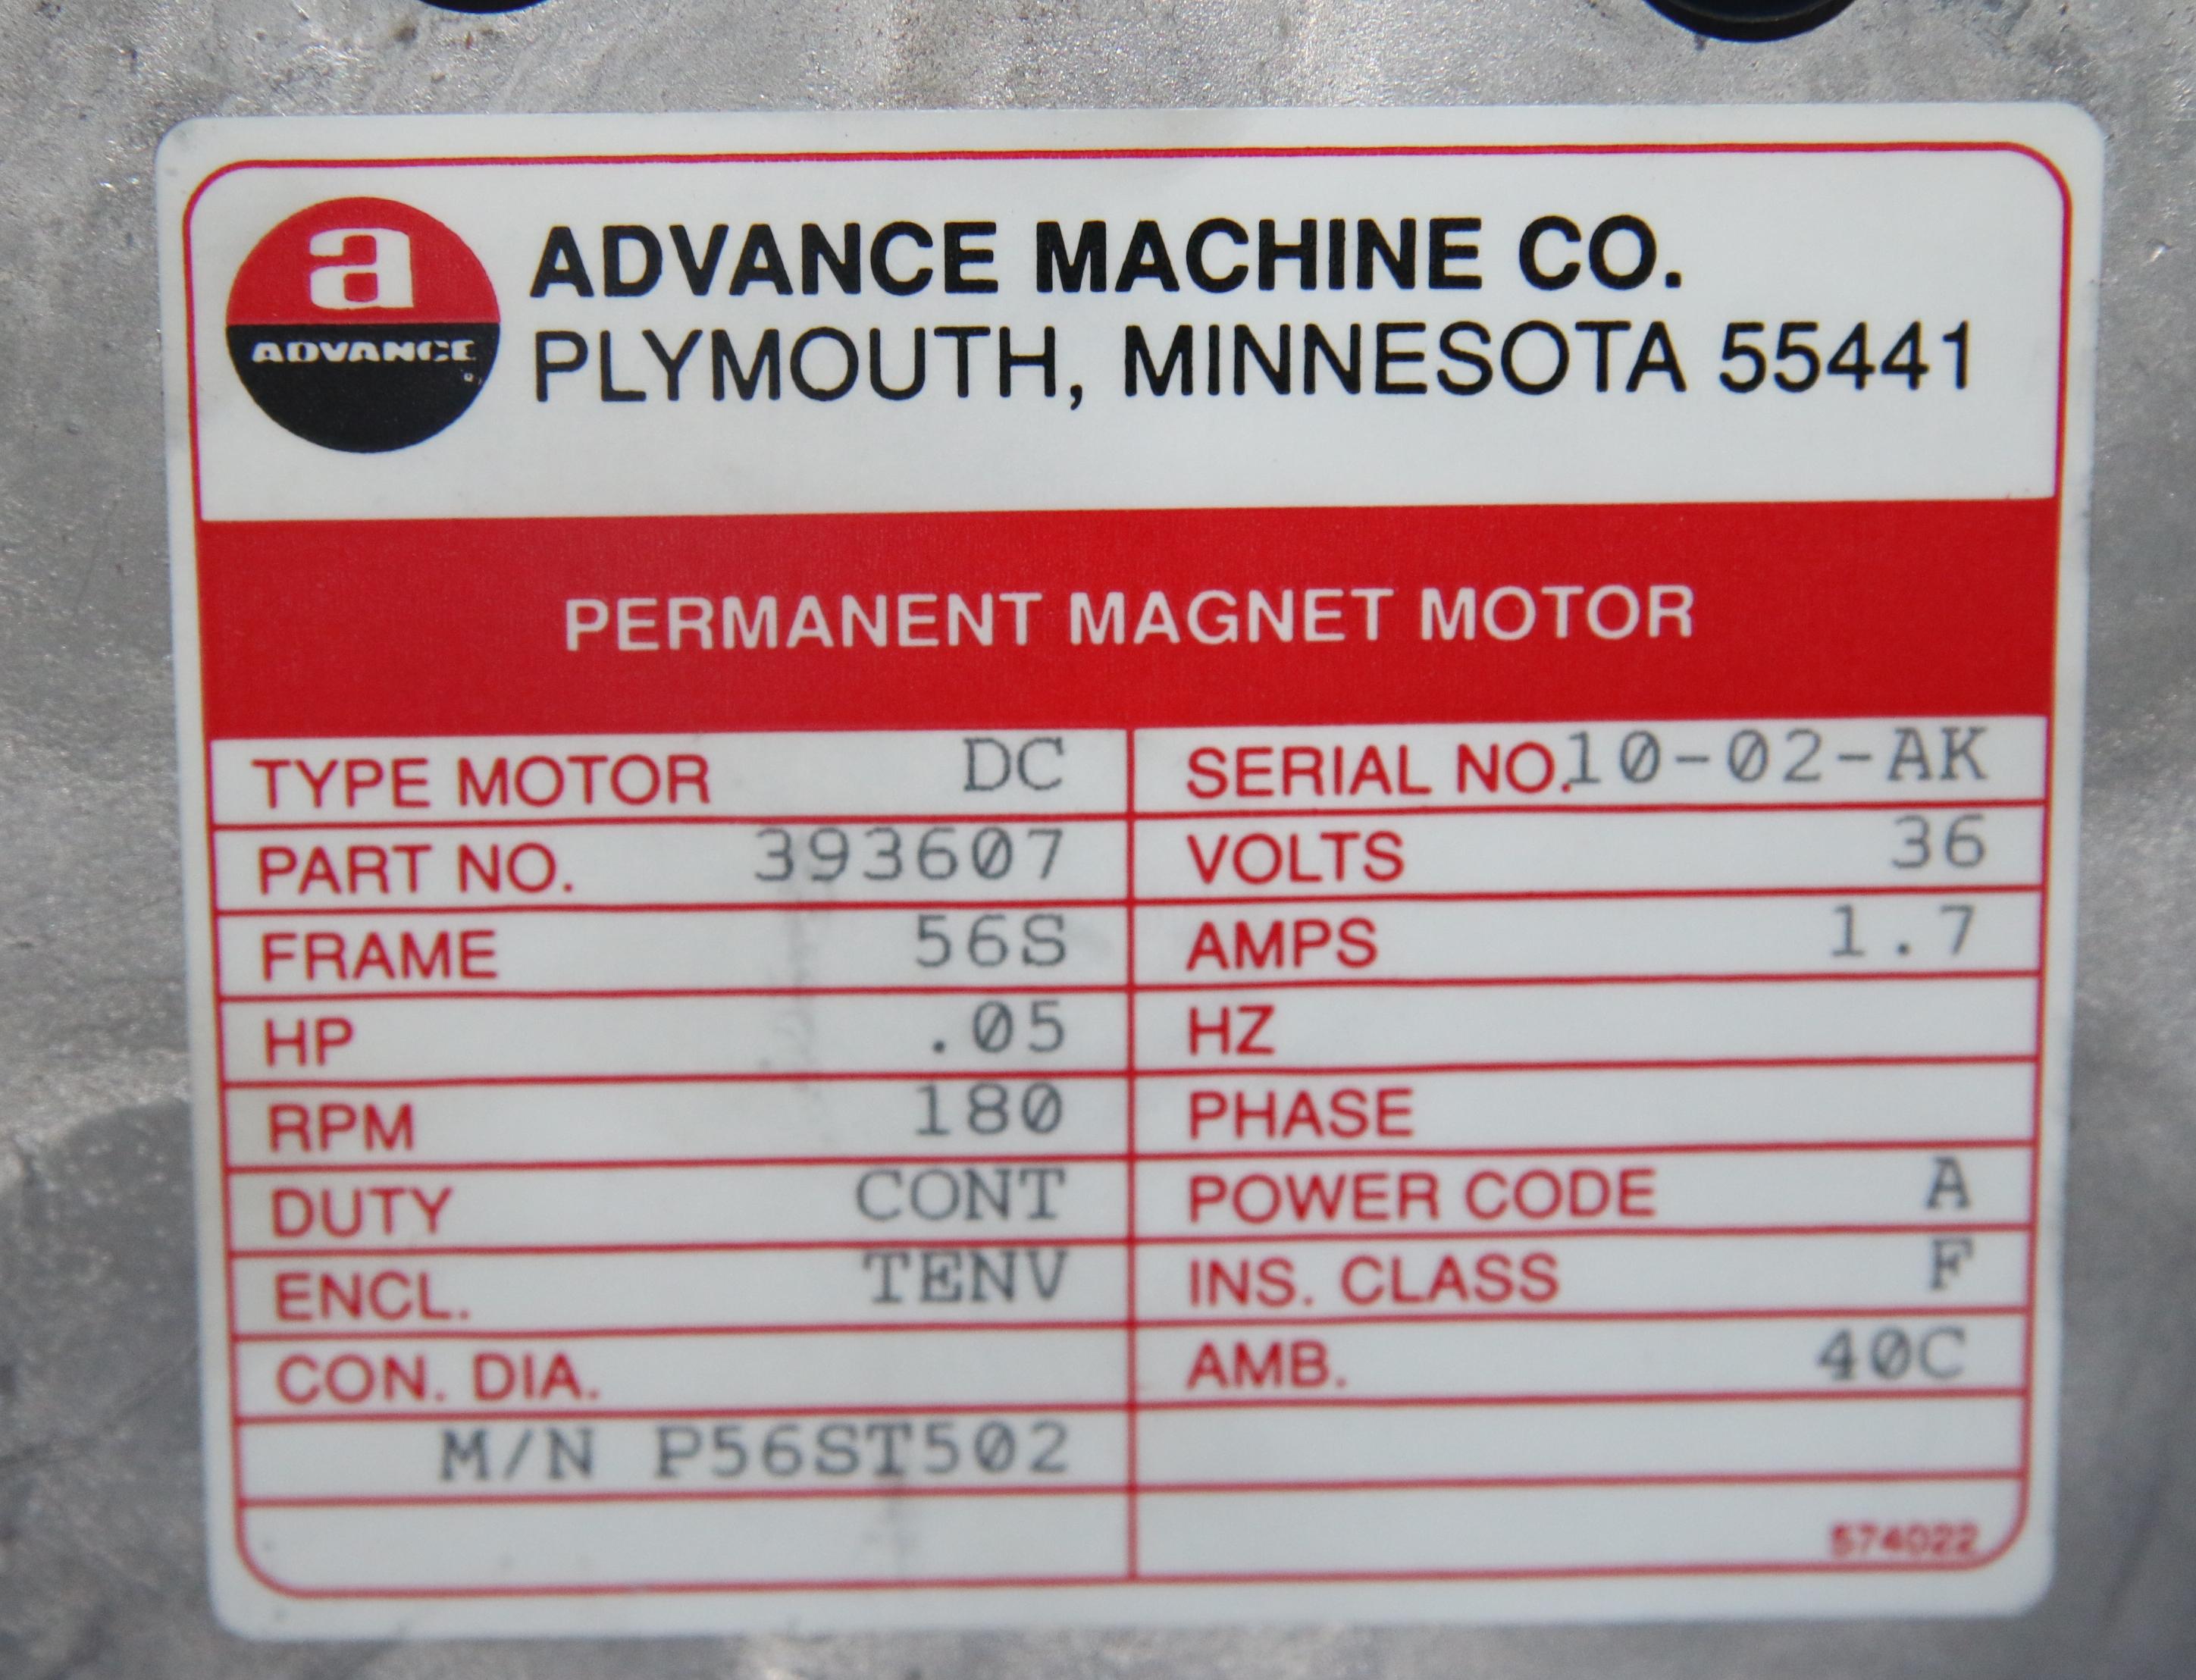 (1) Unused Nilfisk Motor Drive Permanent Magnet Motor Part Number: 56393607 AKA